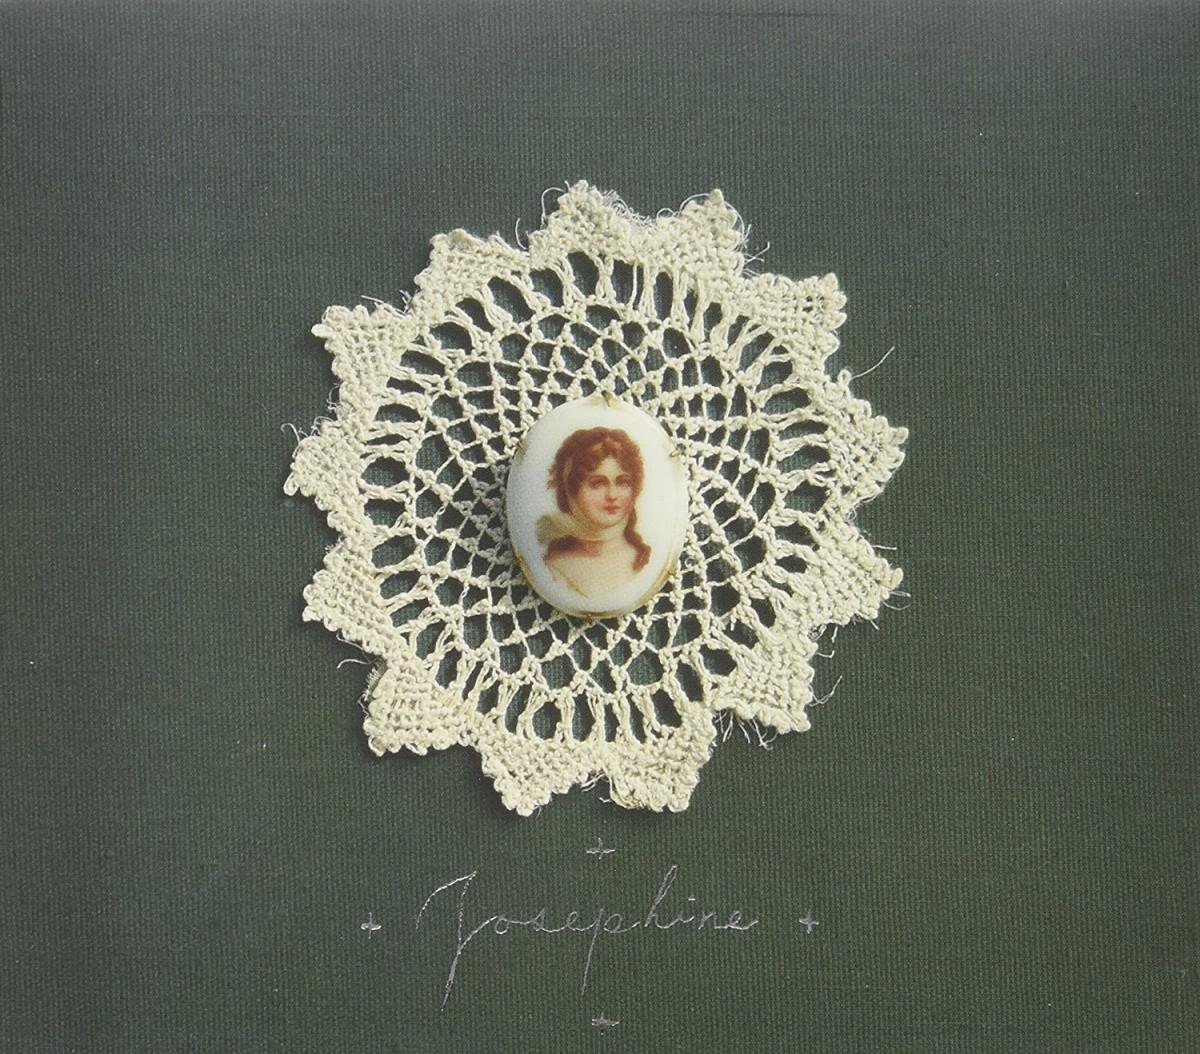 Magnolia Electric Co. Josephine review